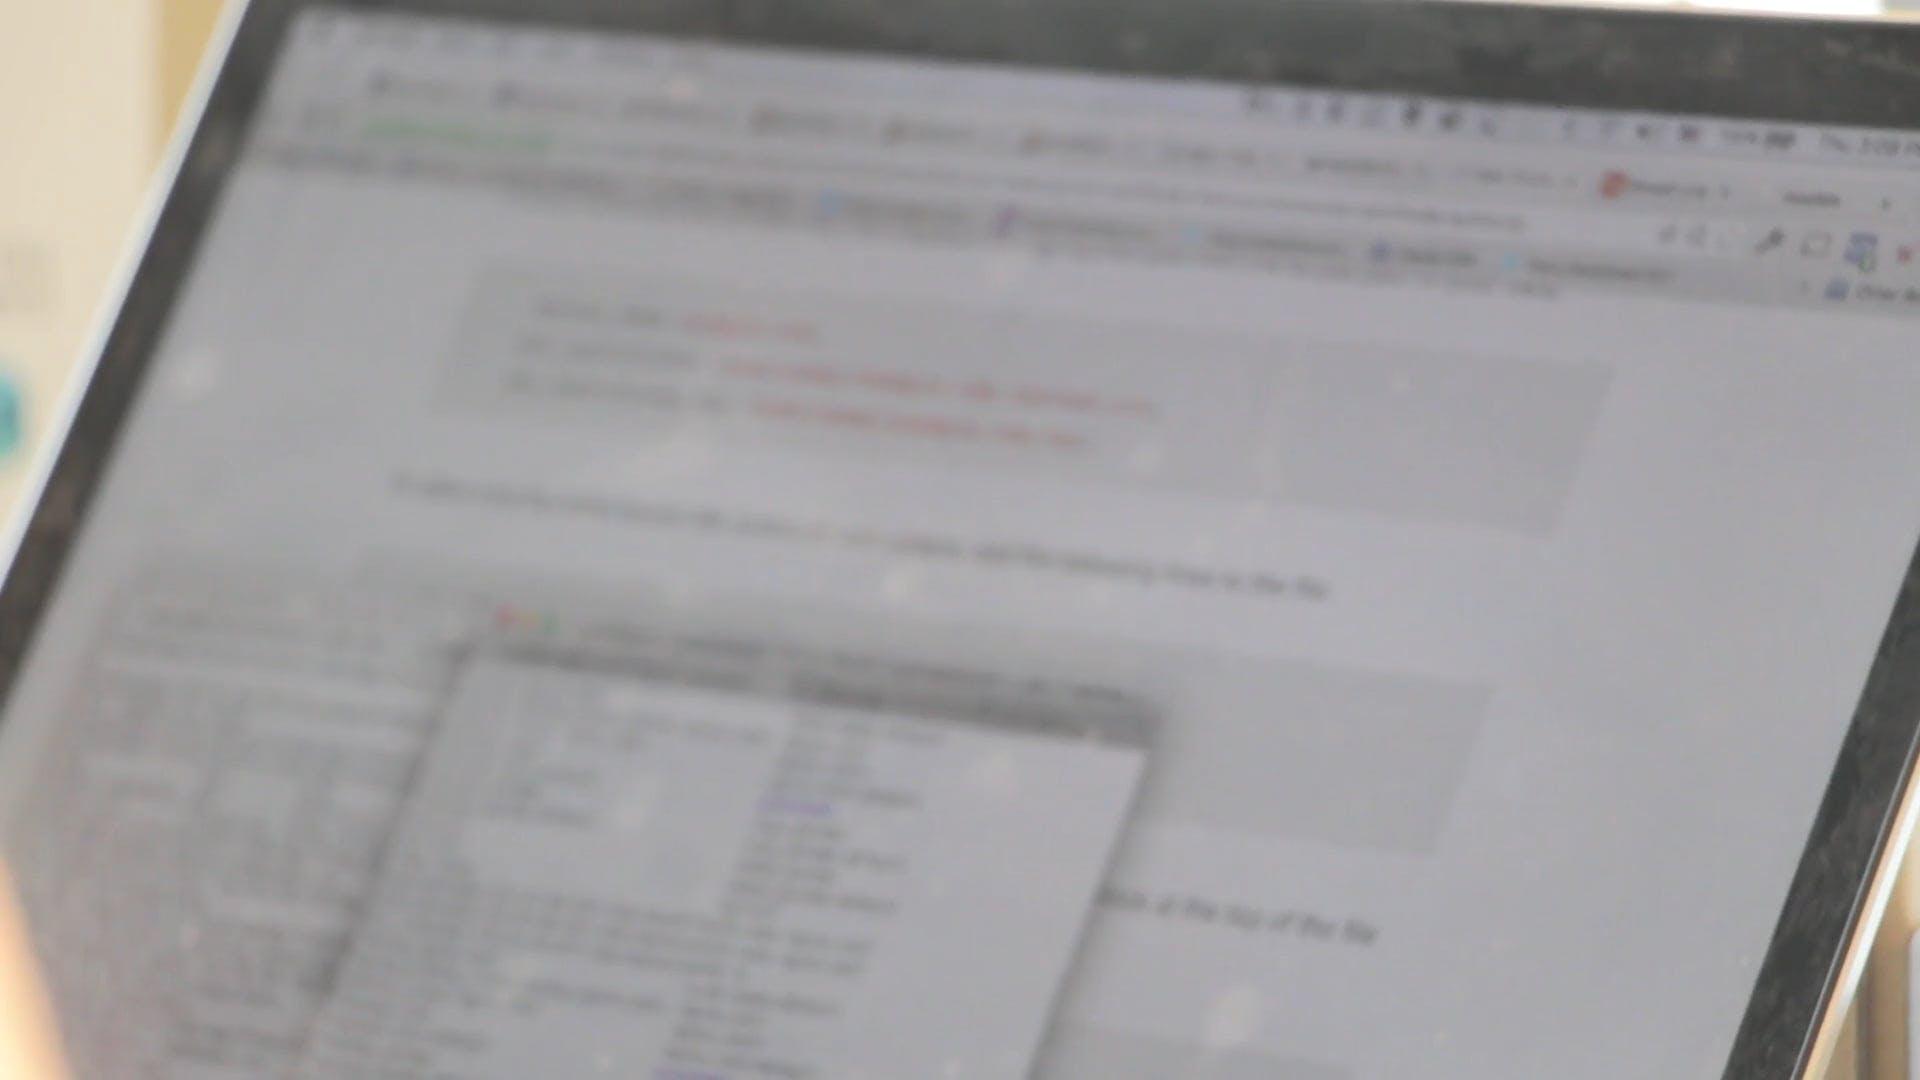 Blurry Video Of Laptop Screen